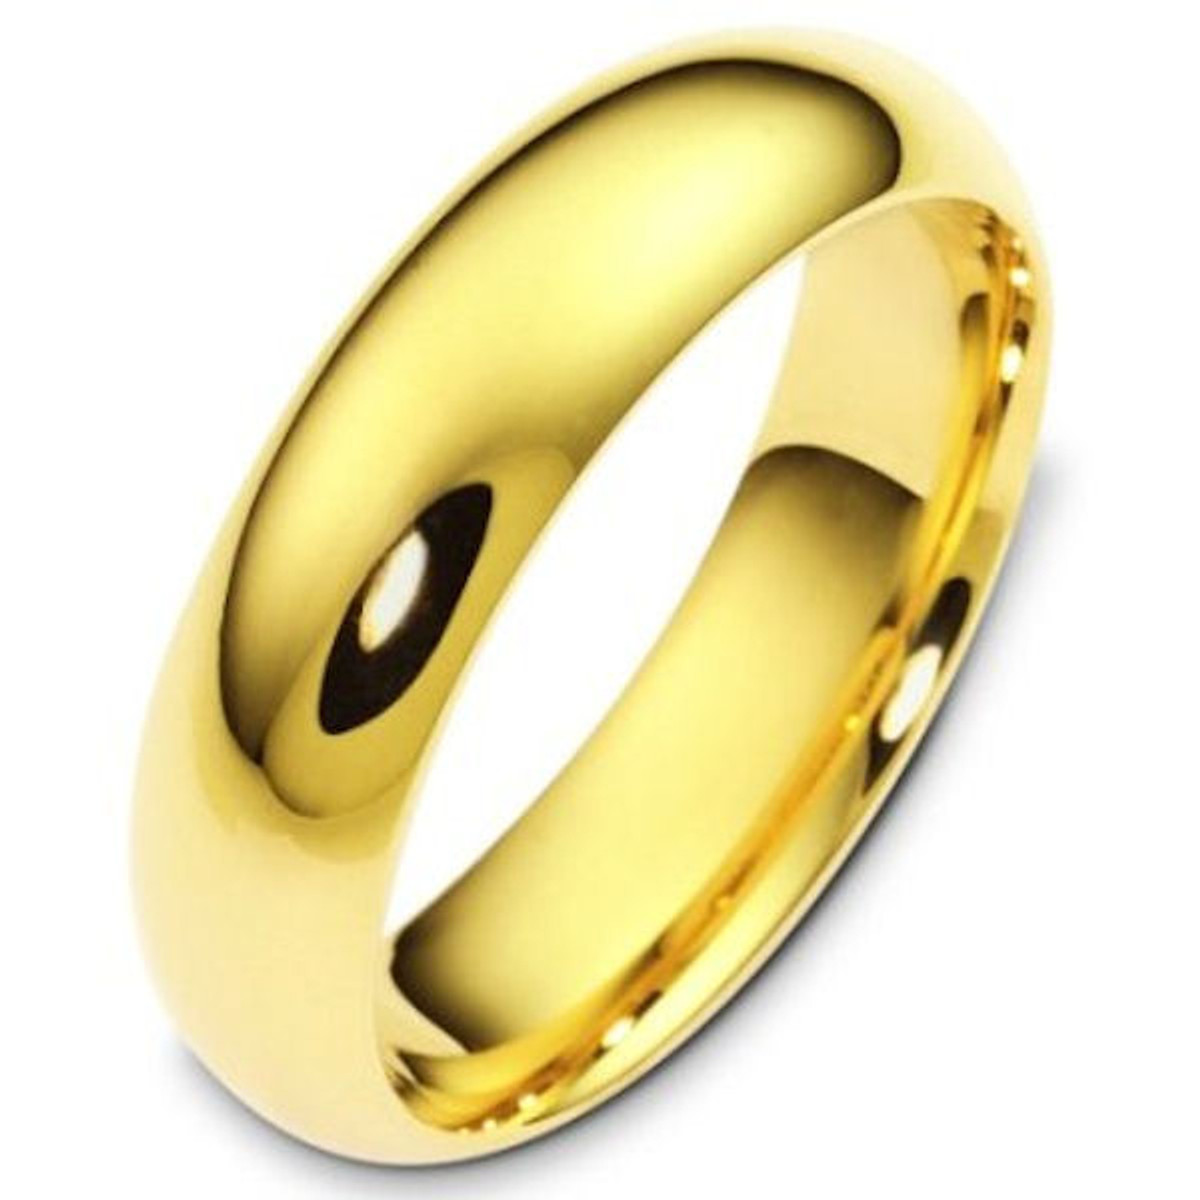 14Kt White Gold 6.0 mm Wide Plain Comfort Fit Wedding Band